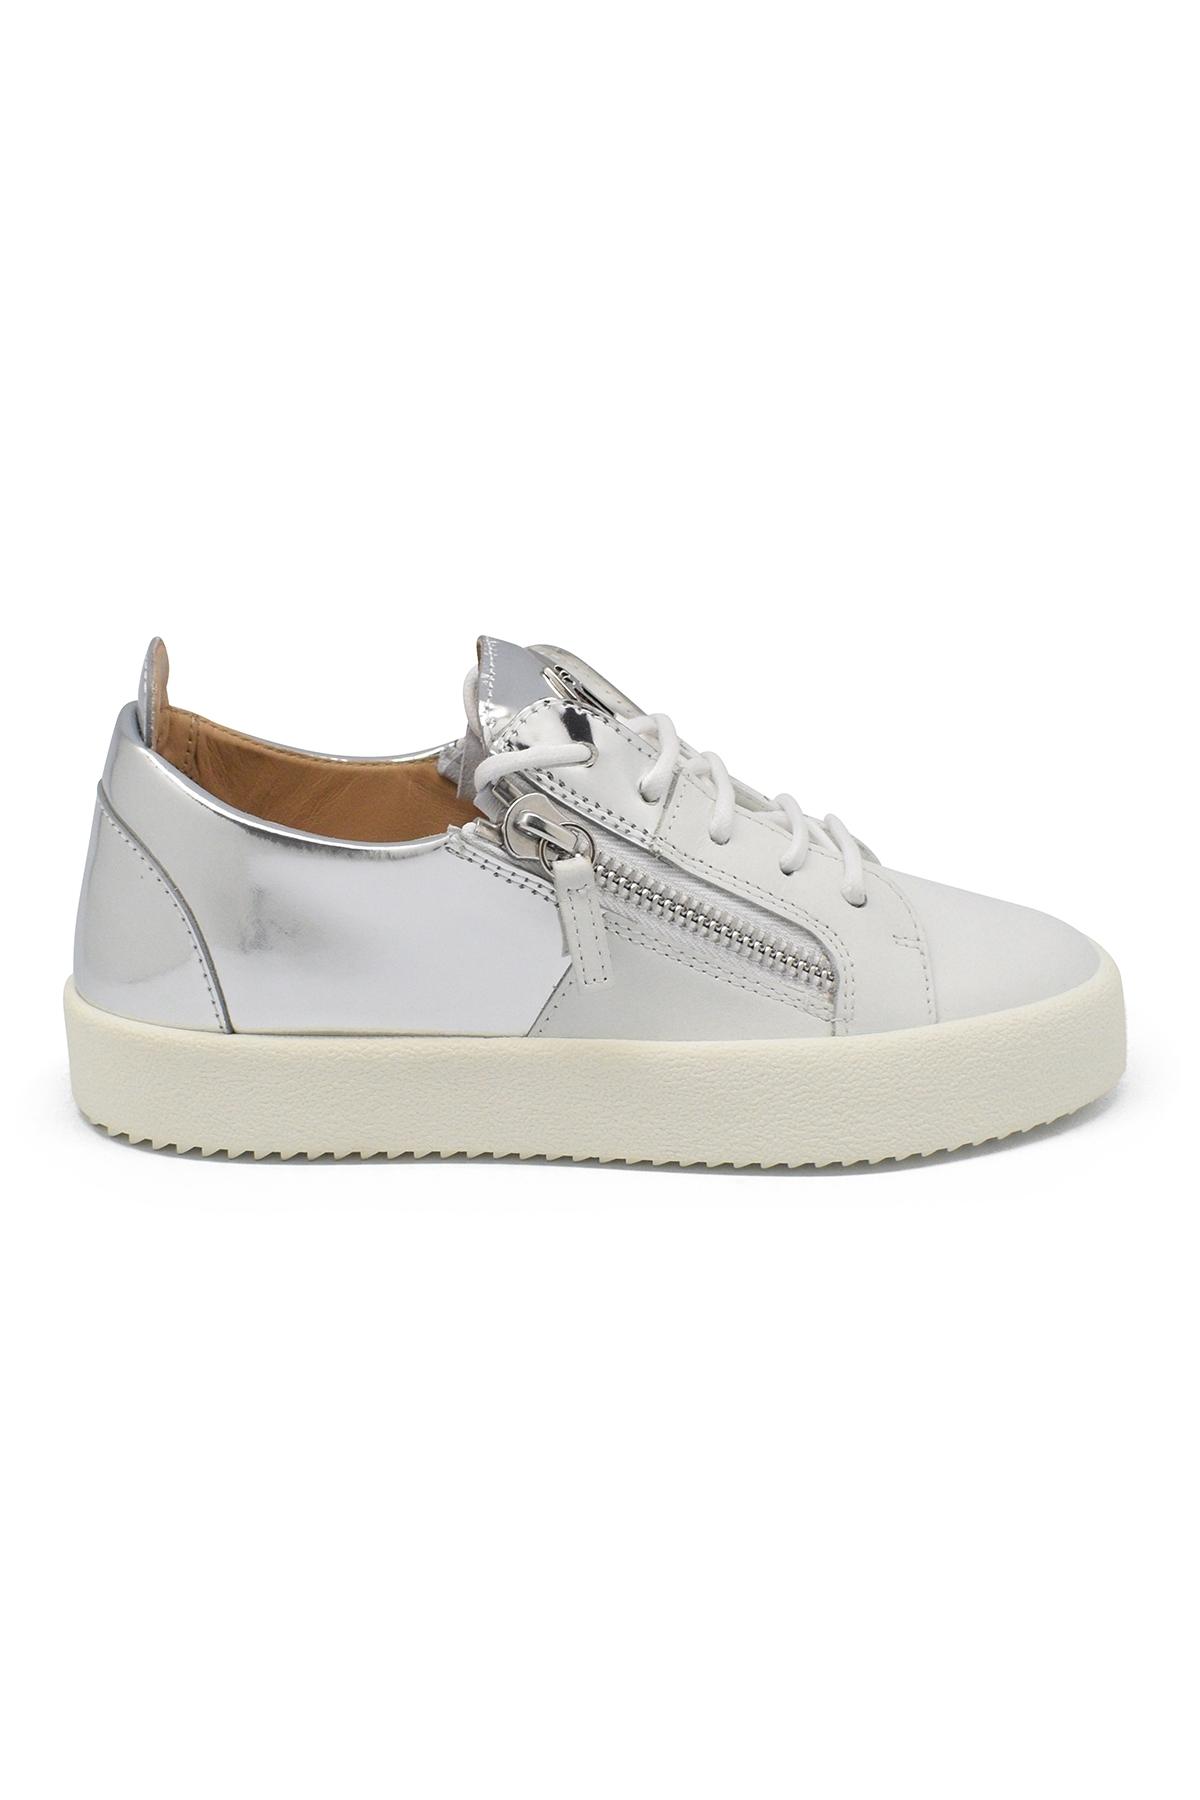 Double sneakers